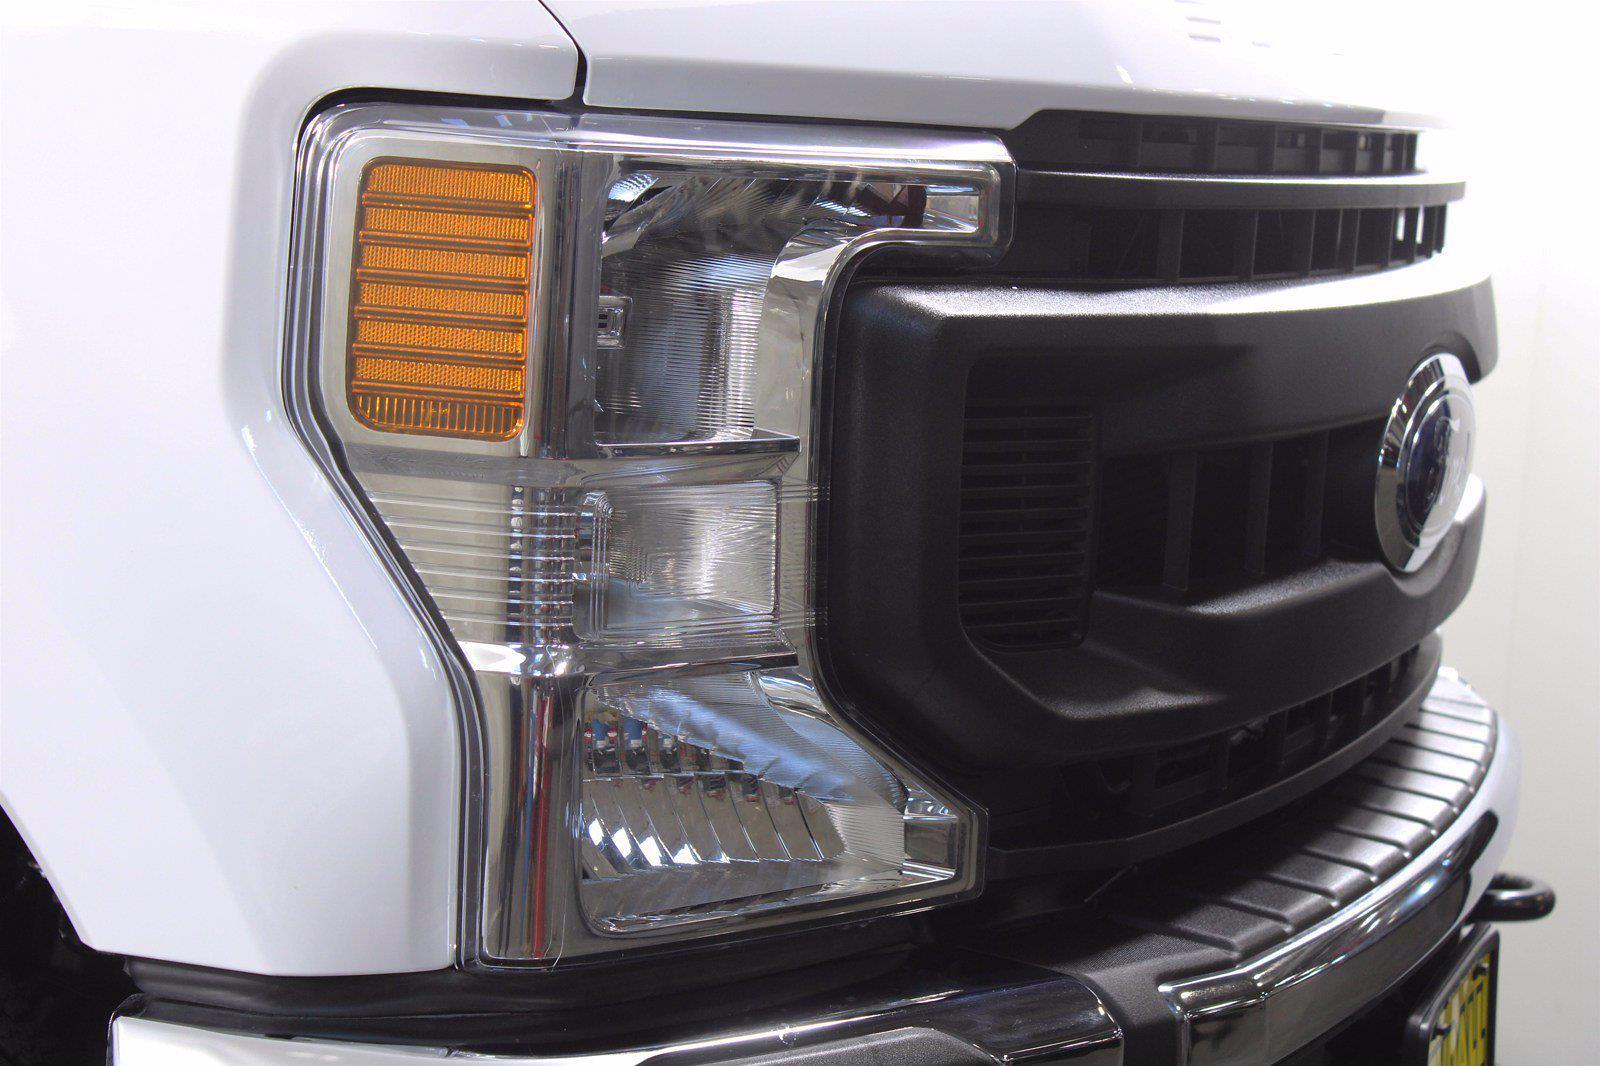 2020 Ford F-350 Crew Cab 4x4, Pickup #DAA0577 - photo 5